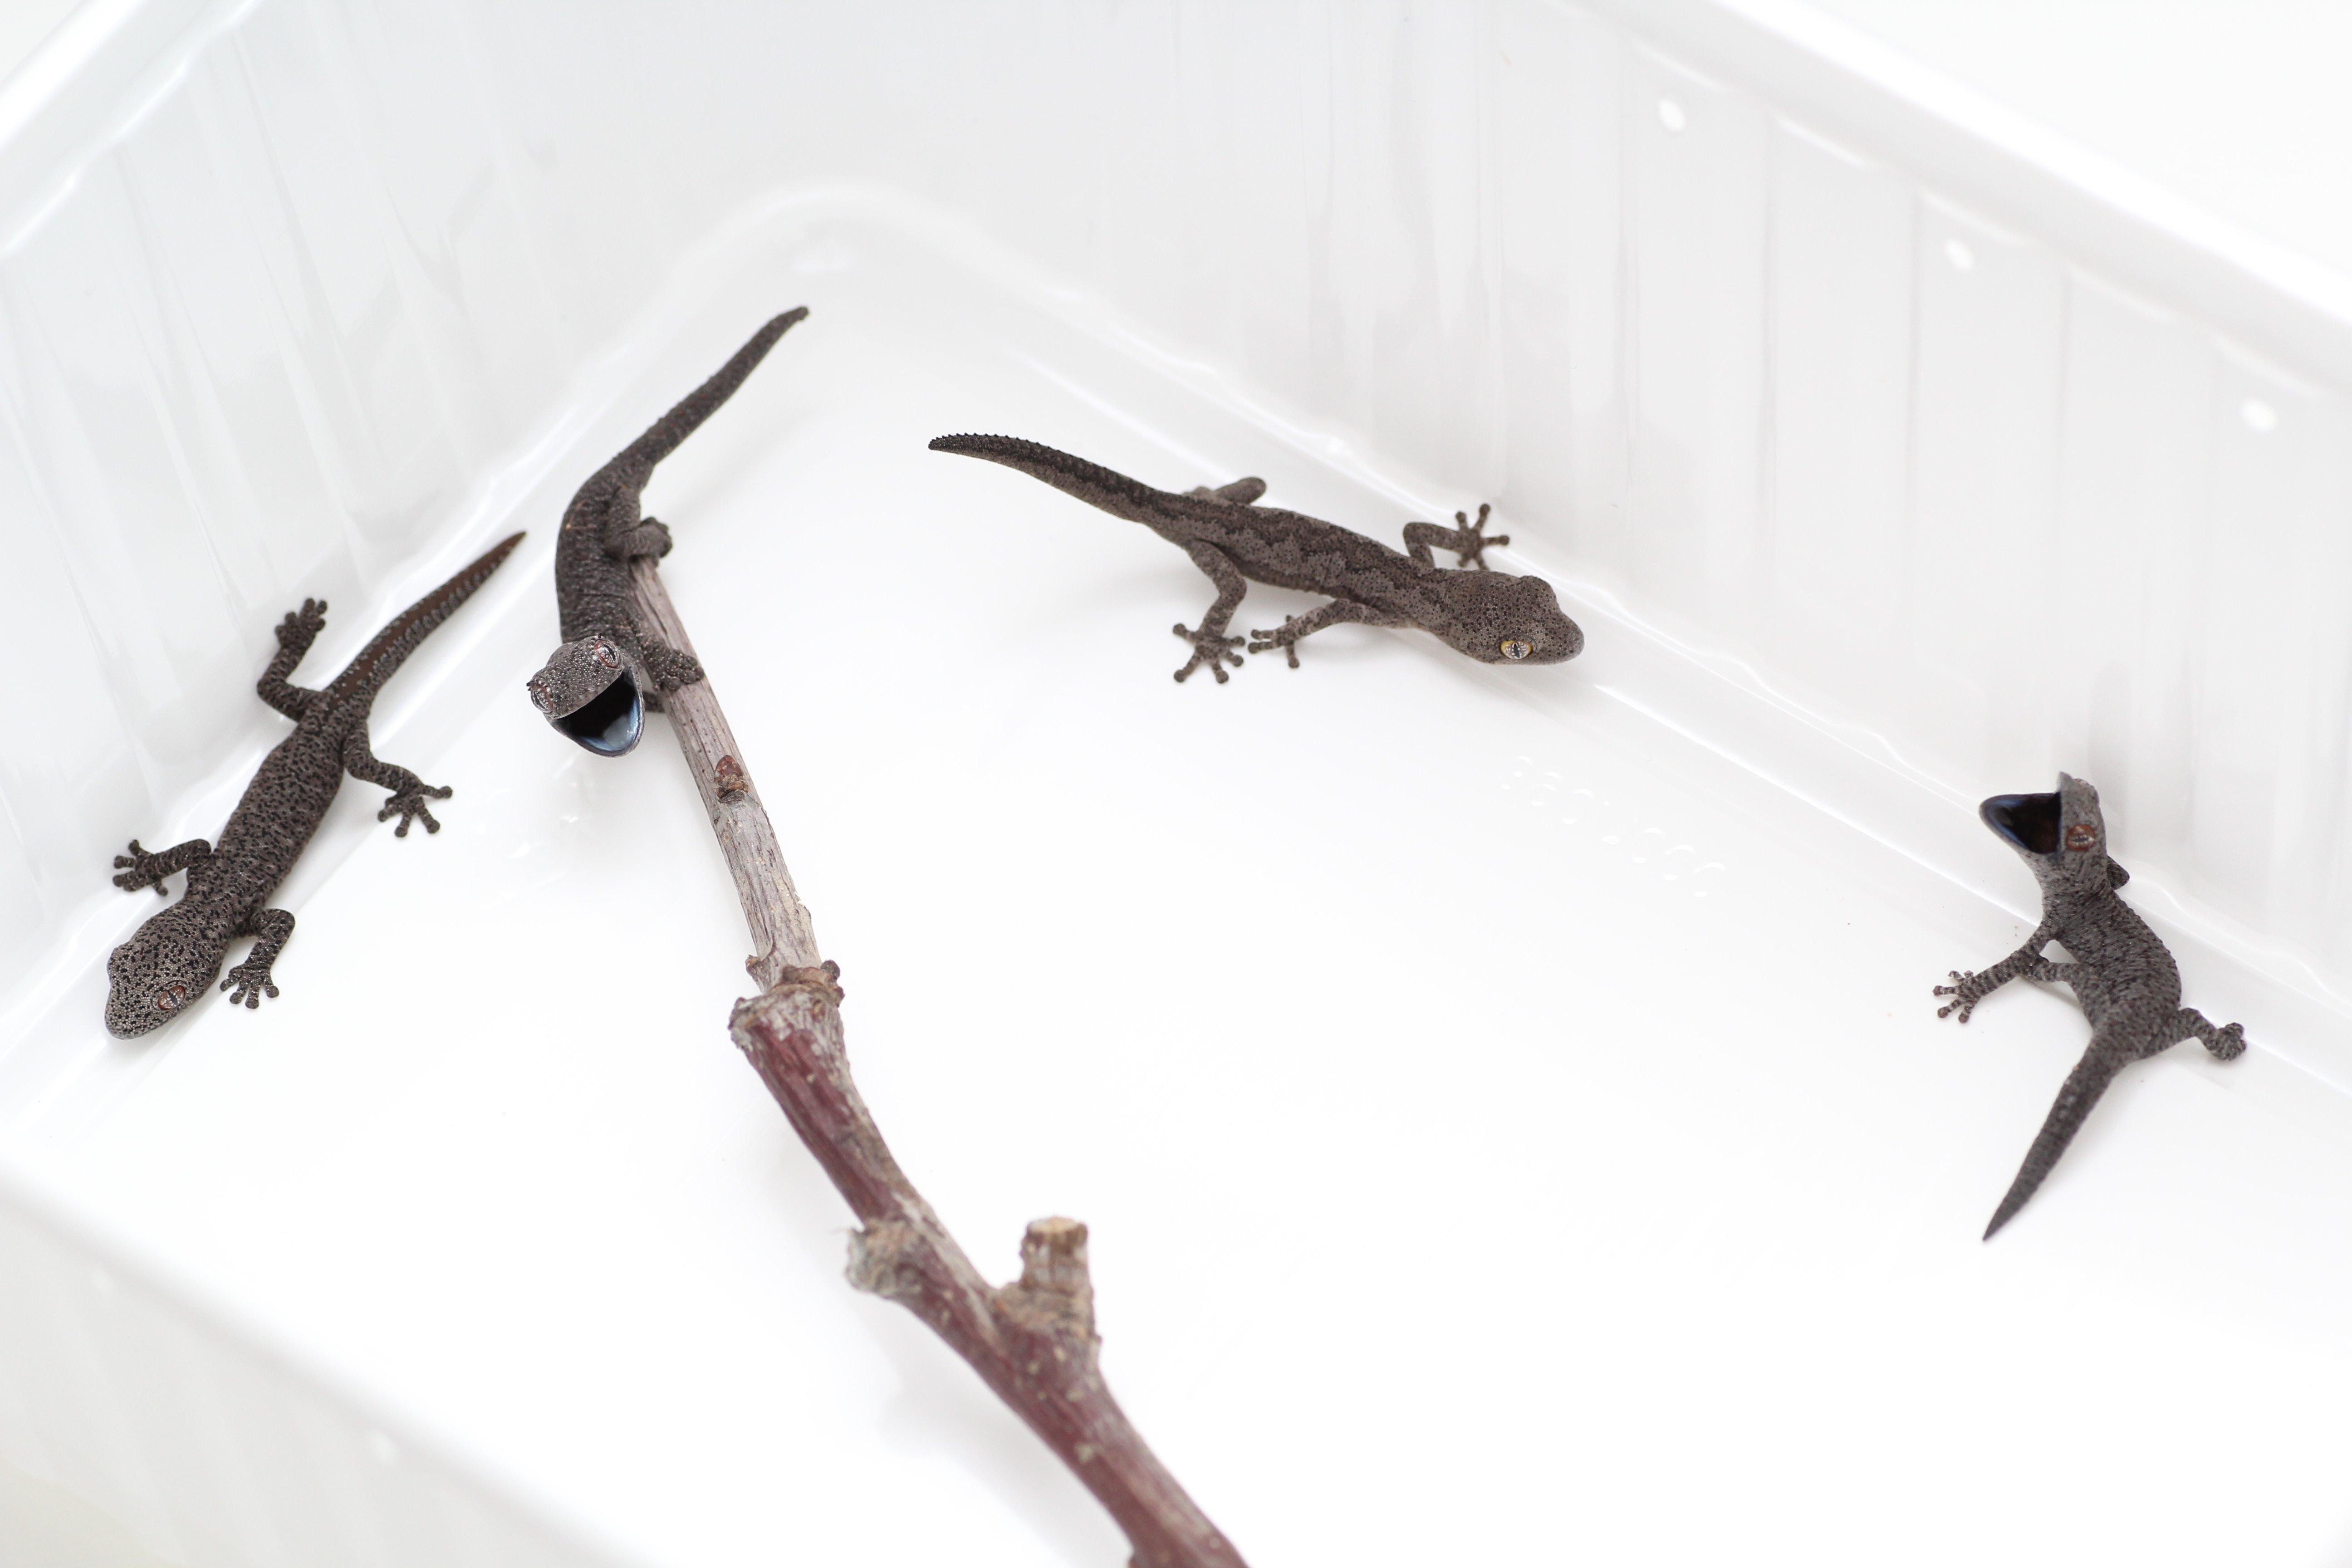 Four species hatched.